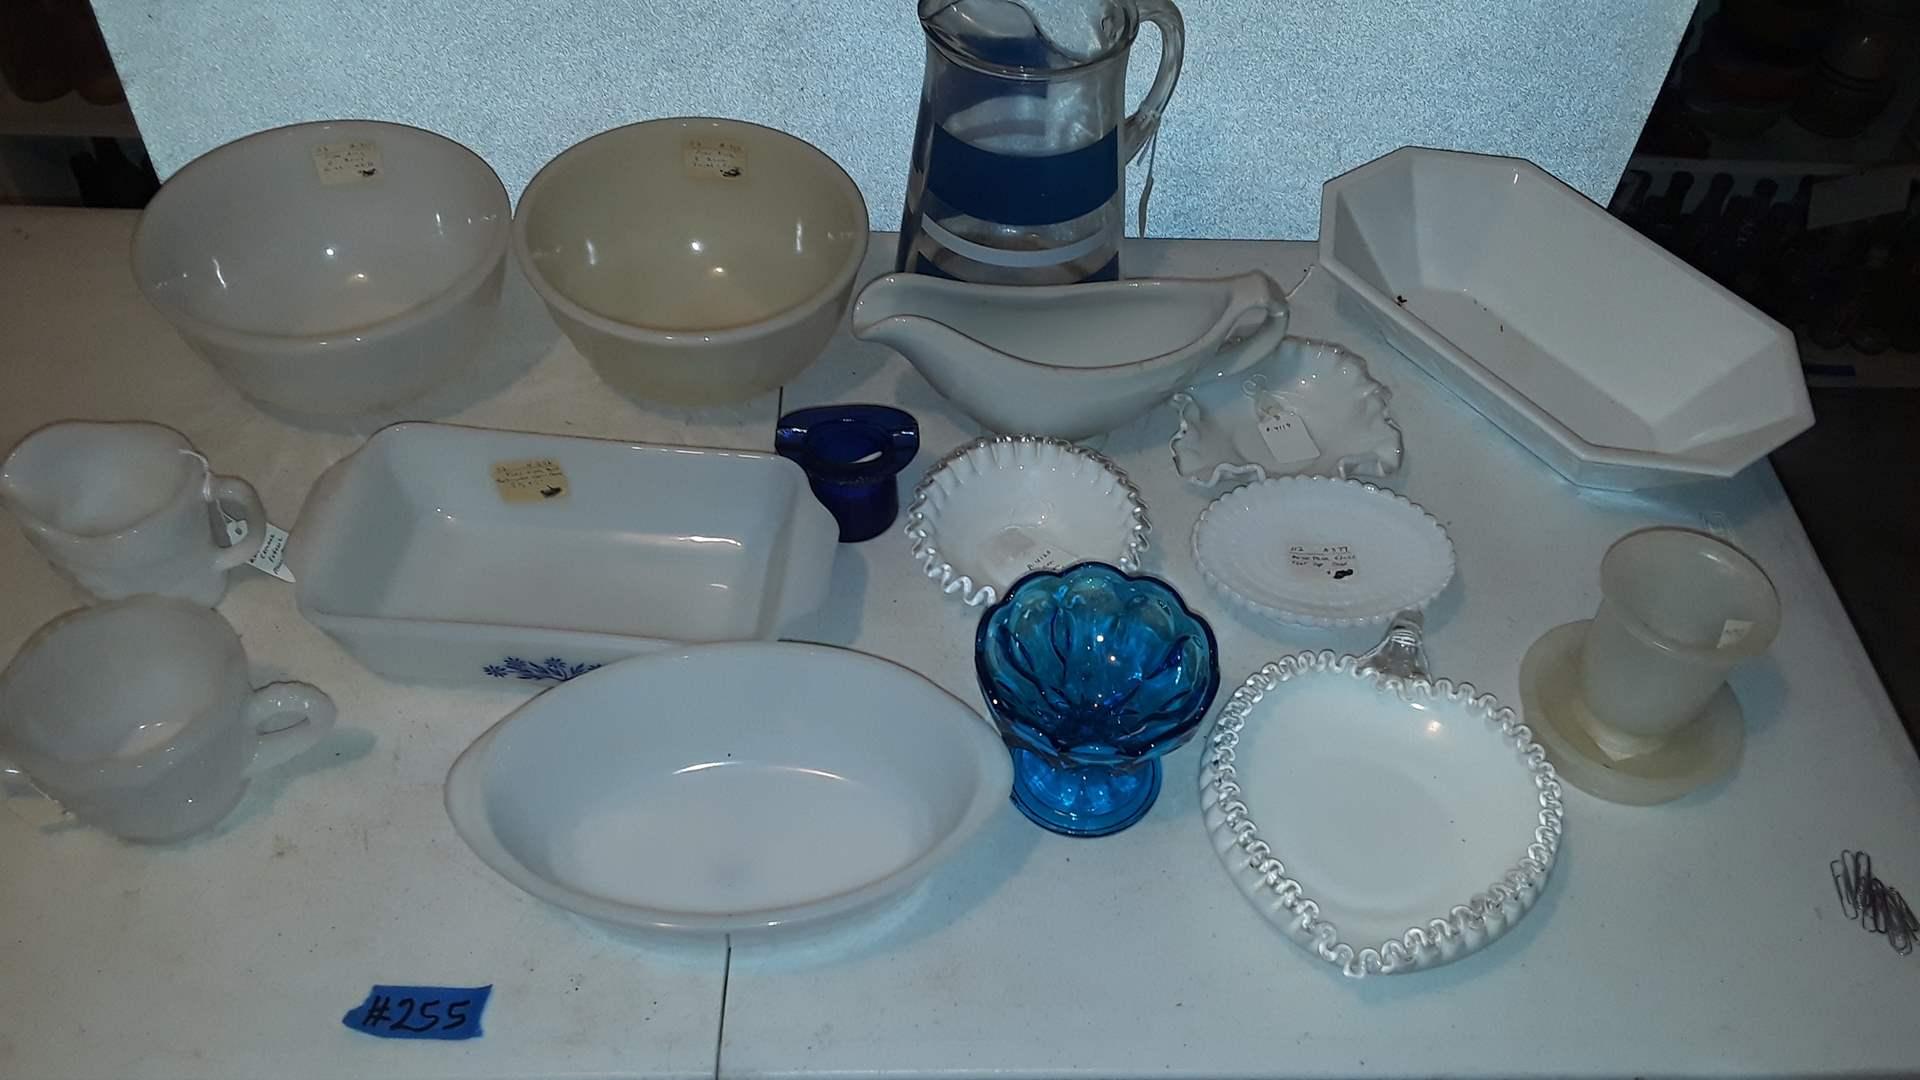 Lot # 255 VINTAGE GLASSWARE FENTON, GLASBAKE, BLUE STRIPE ICE LIP PITCHER, FIREKING BOWLS